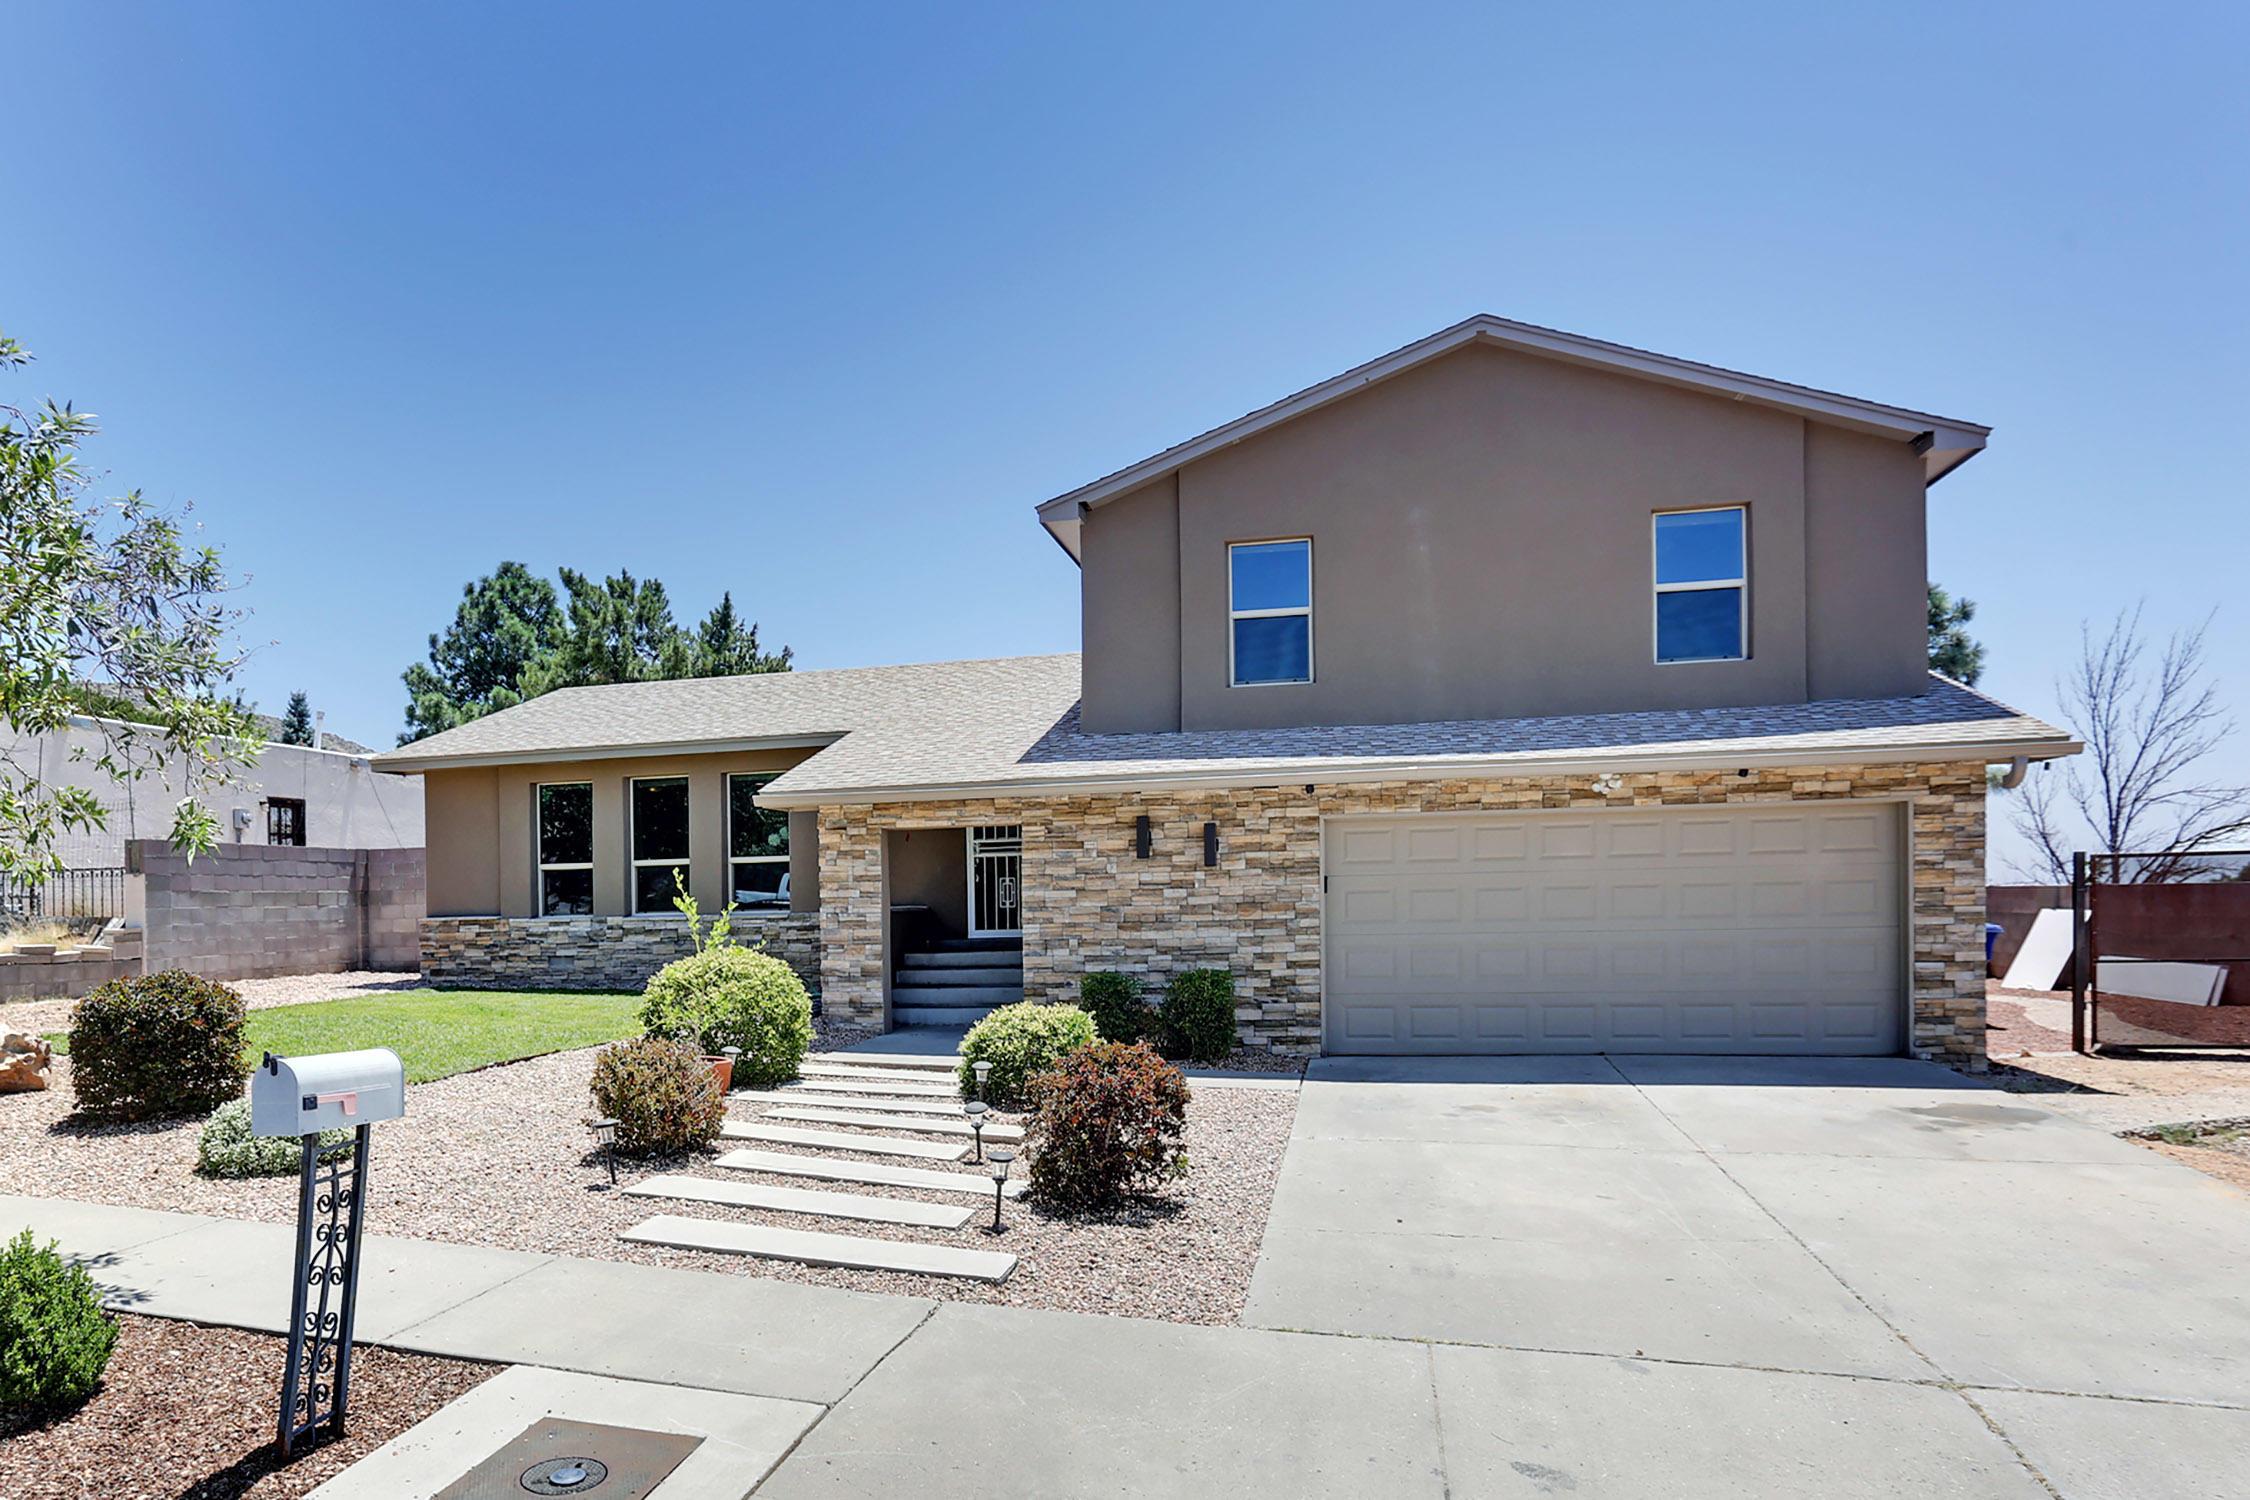 12600 Hugh Graham,Albuquerque,New Mexico,United States 87111,3 Bedrooms Bedrooms,3 BathroomsBathrooms,Residential,Hugh Graham,924603